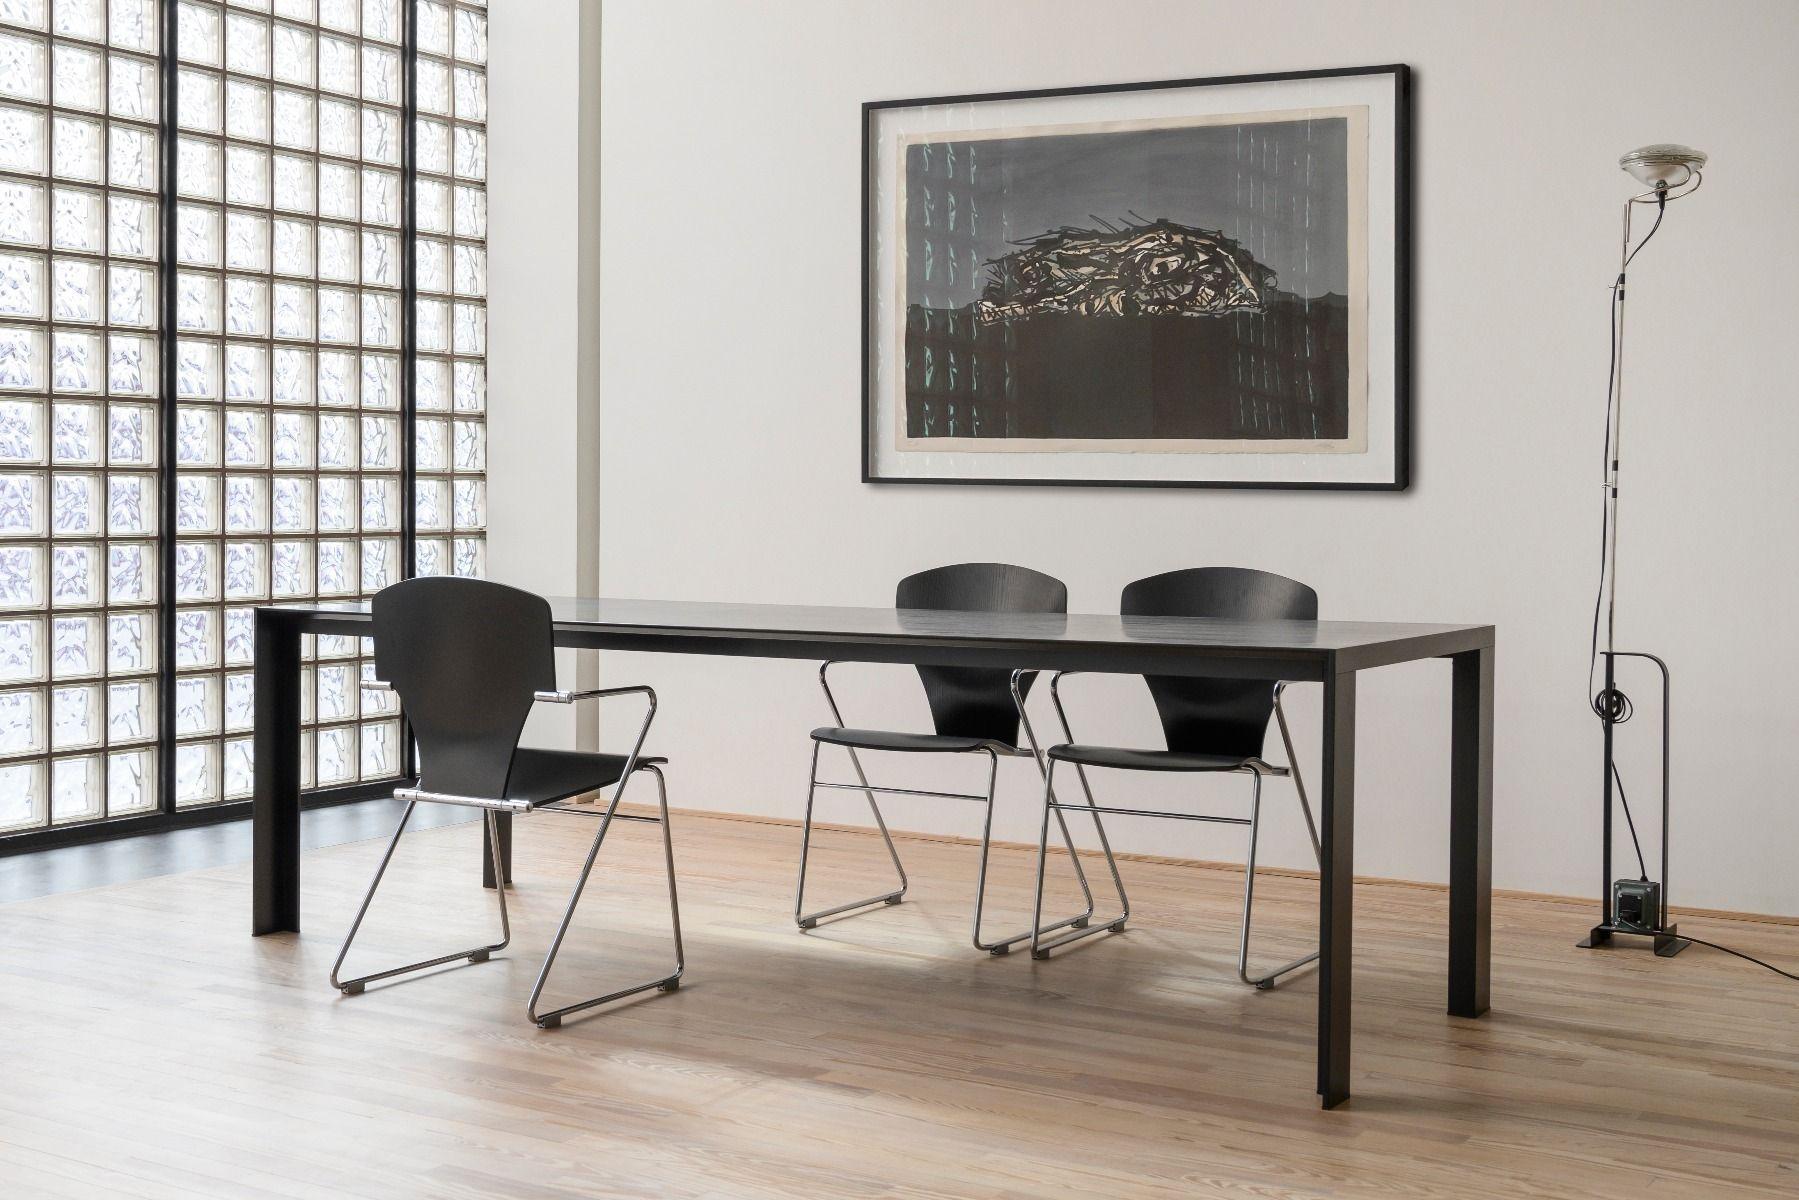 STUA Egoa Chairs around a black table